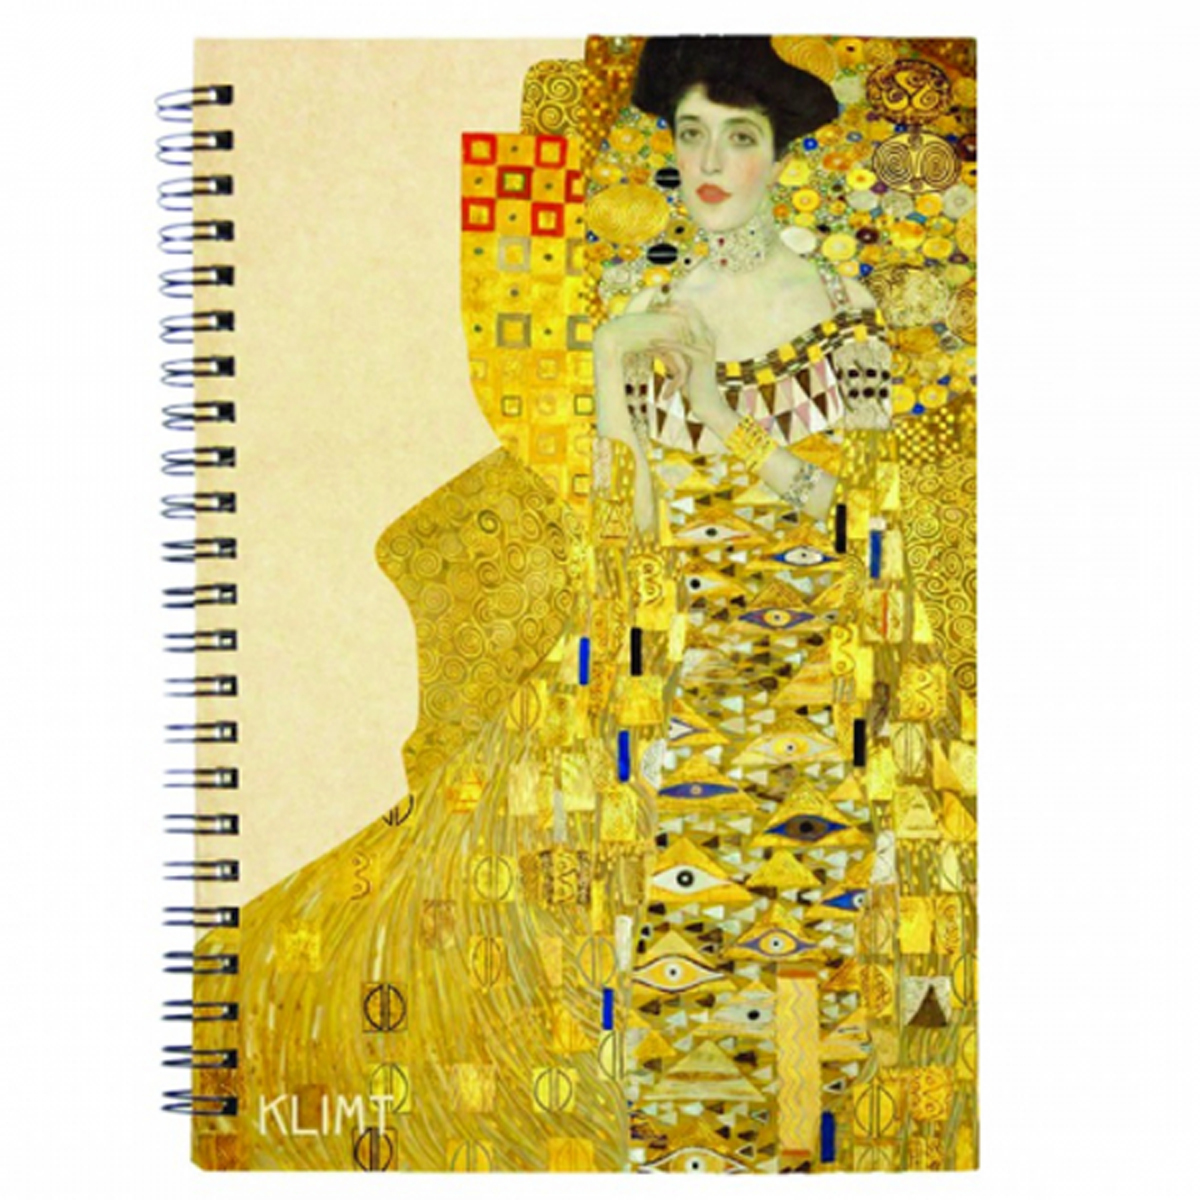 Carnet à spirale \'Gustav Klimt\' (Adèle) - 18x13 cm - [R2006]